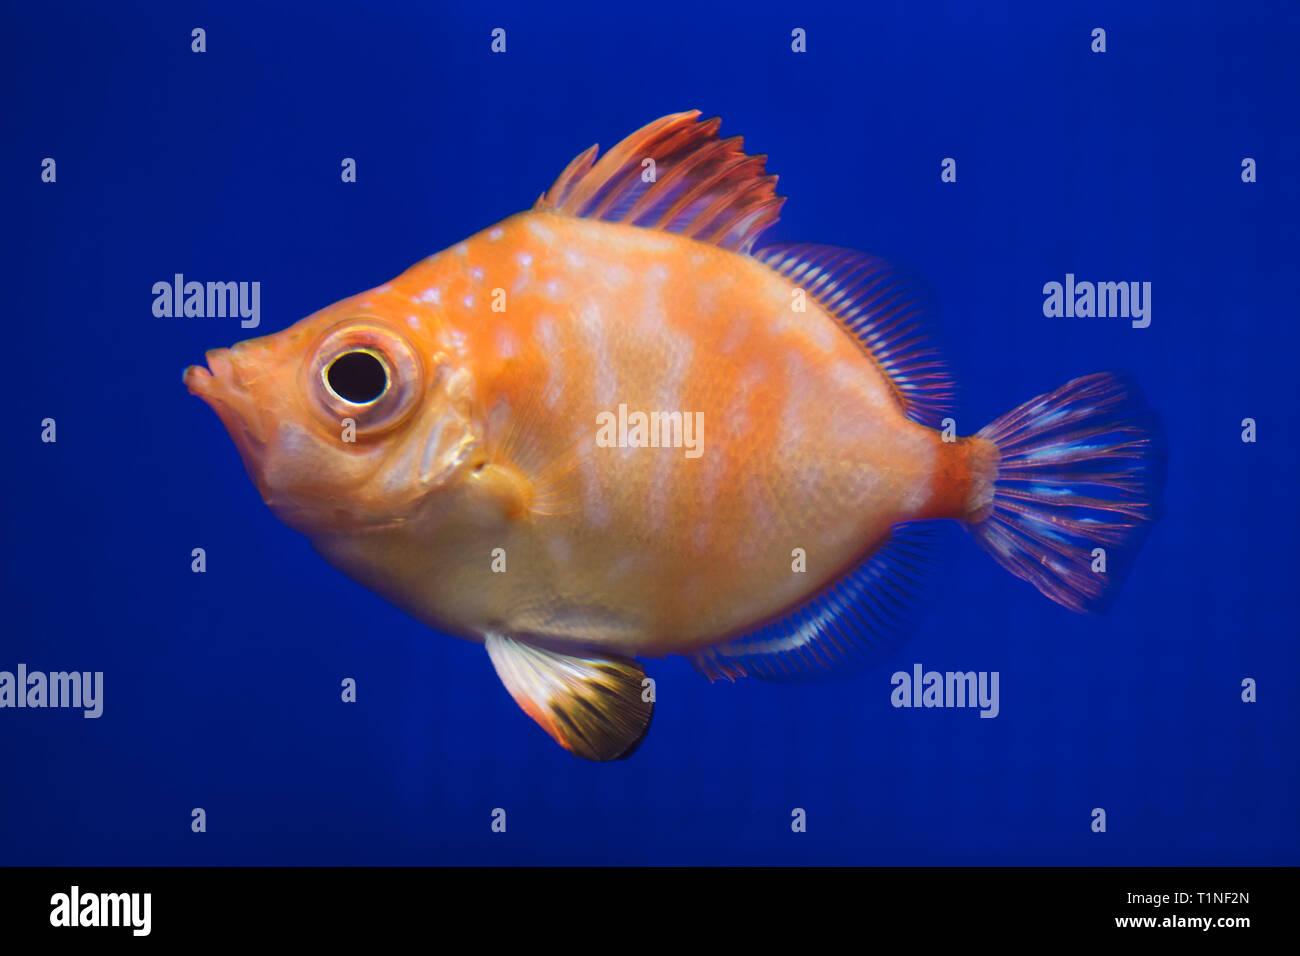 Boarfish (Capros aper). Marine fish. Stock Photo